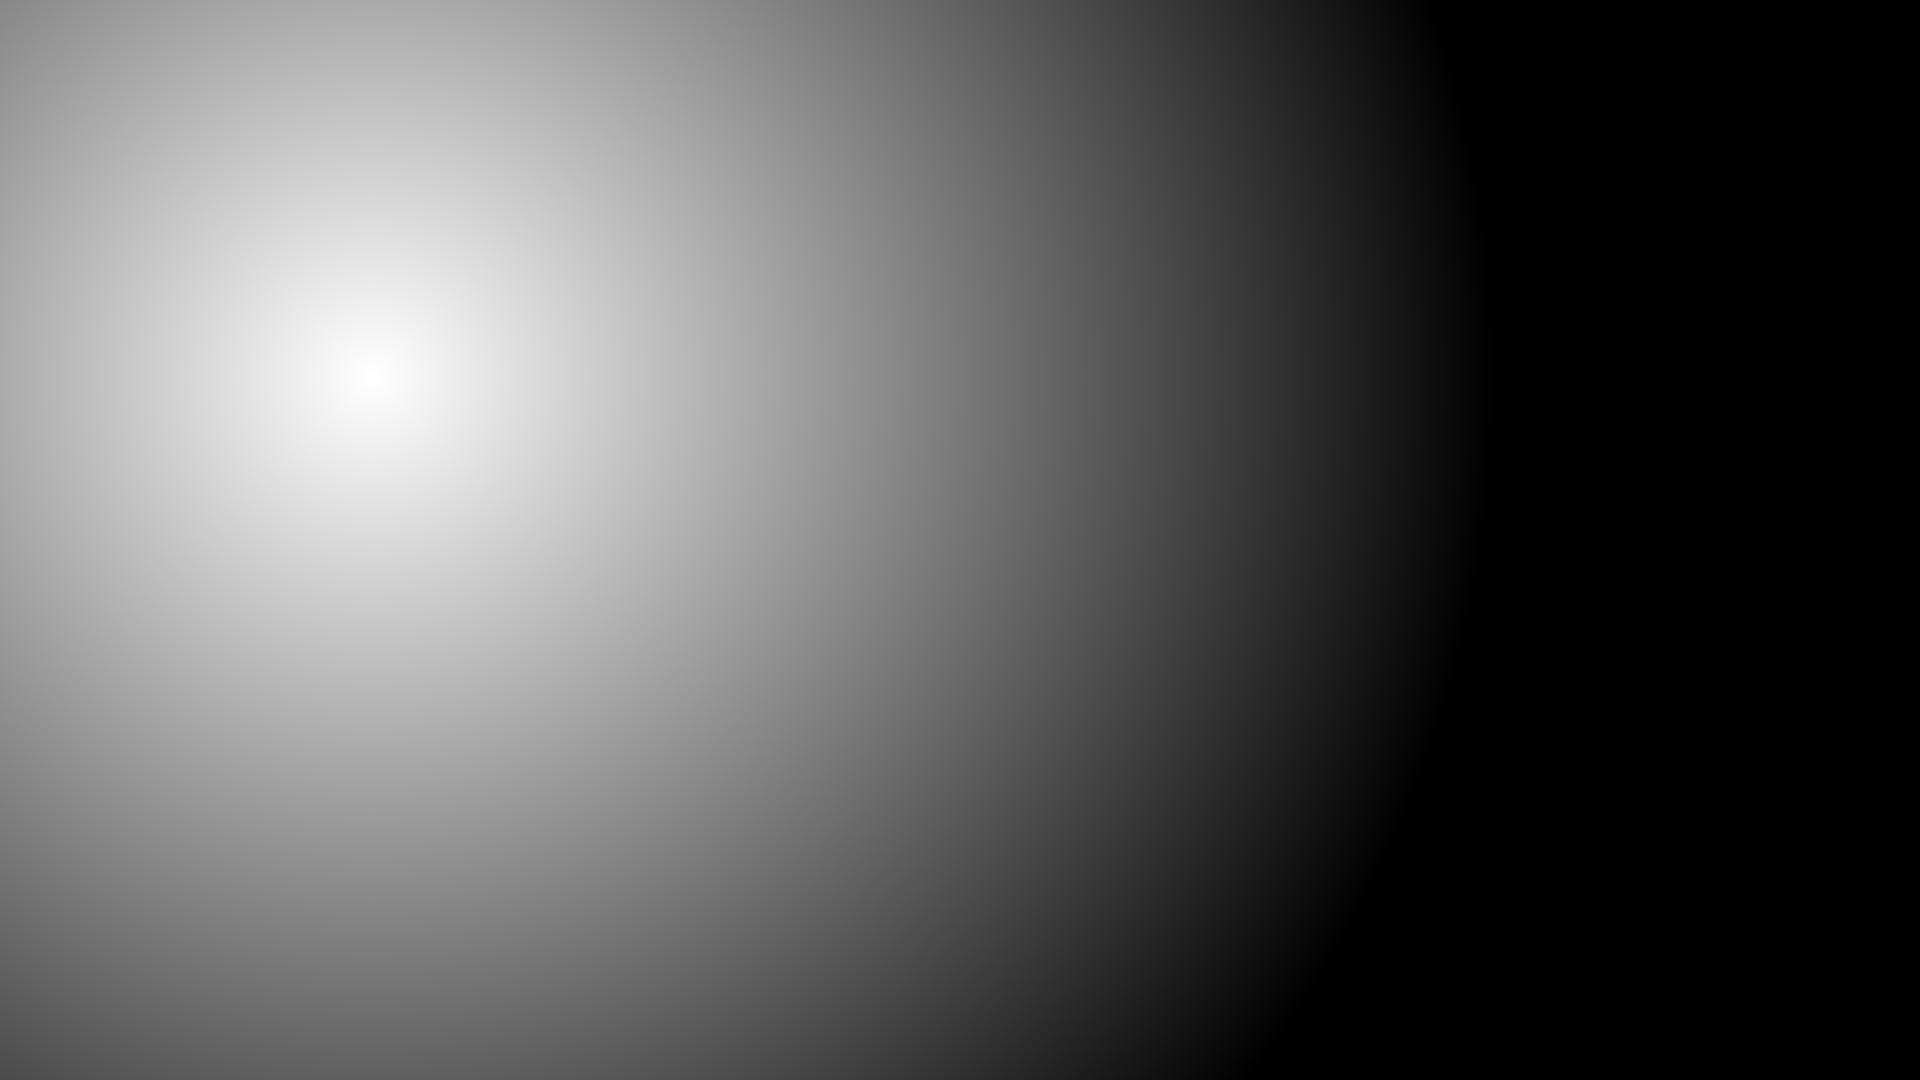 Black And White Desktop wallpaper   853876 1920x1080